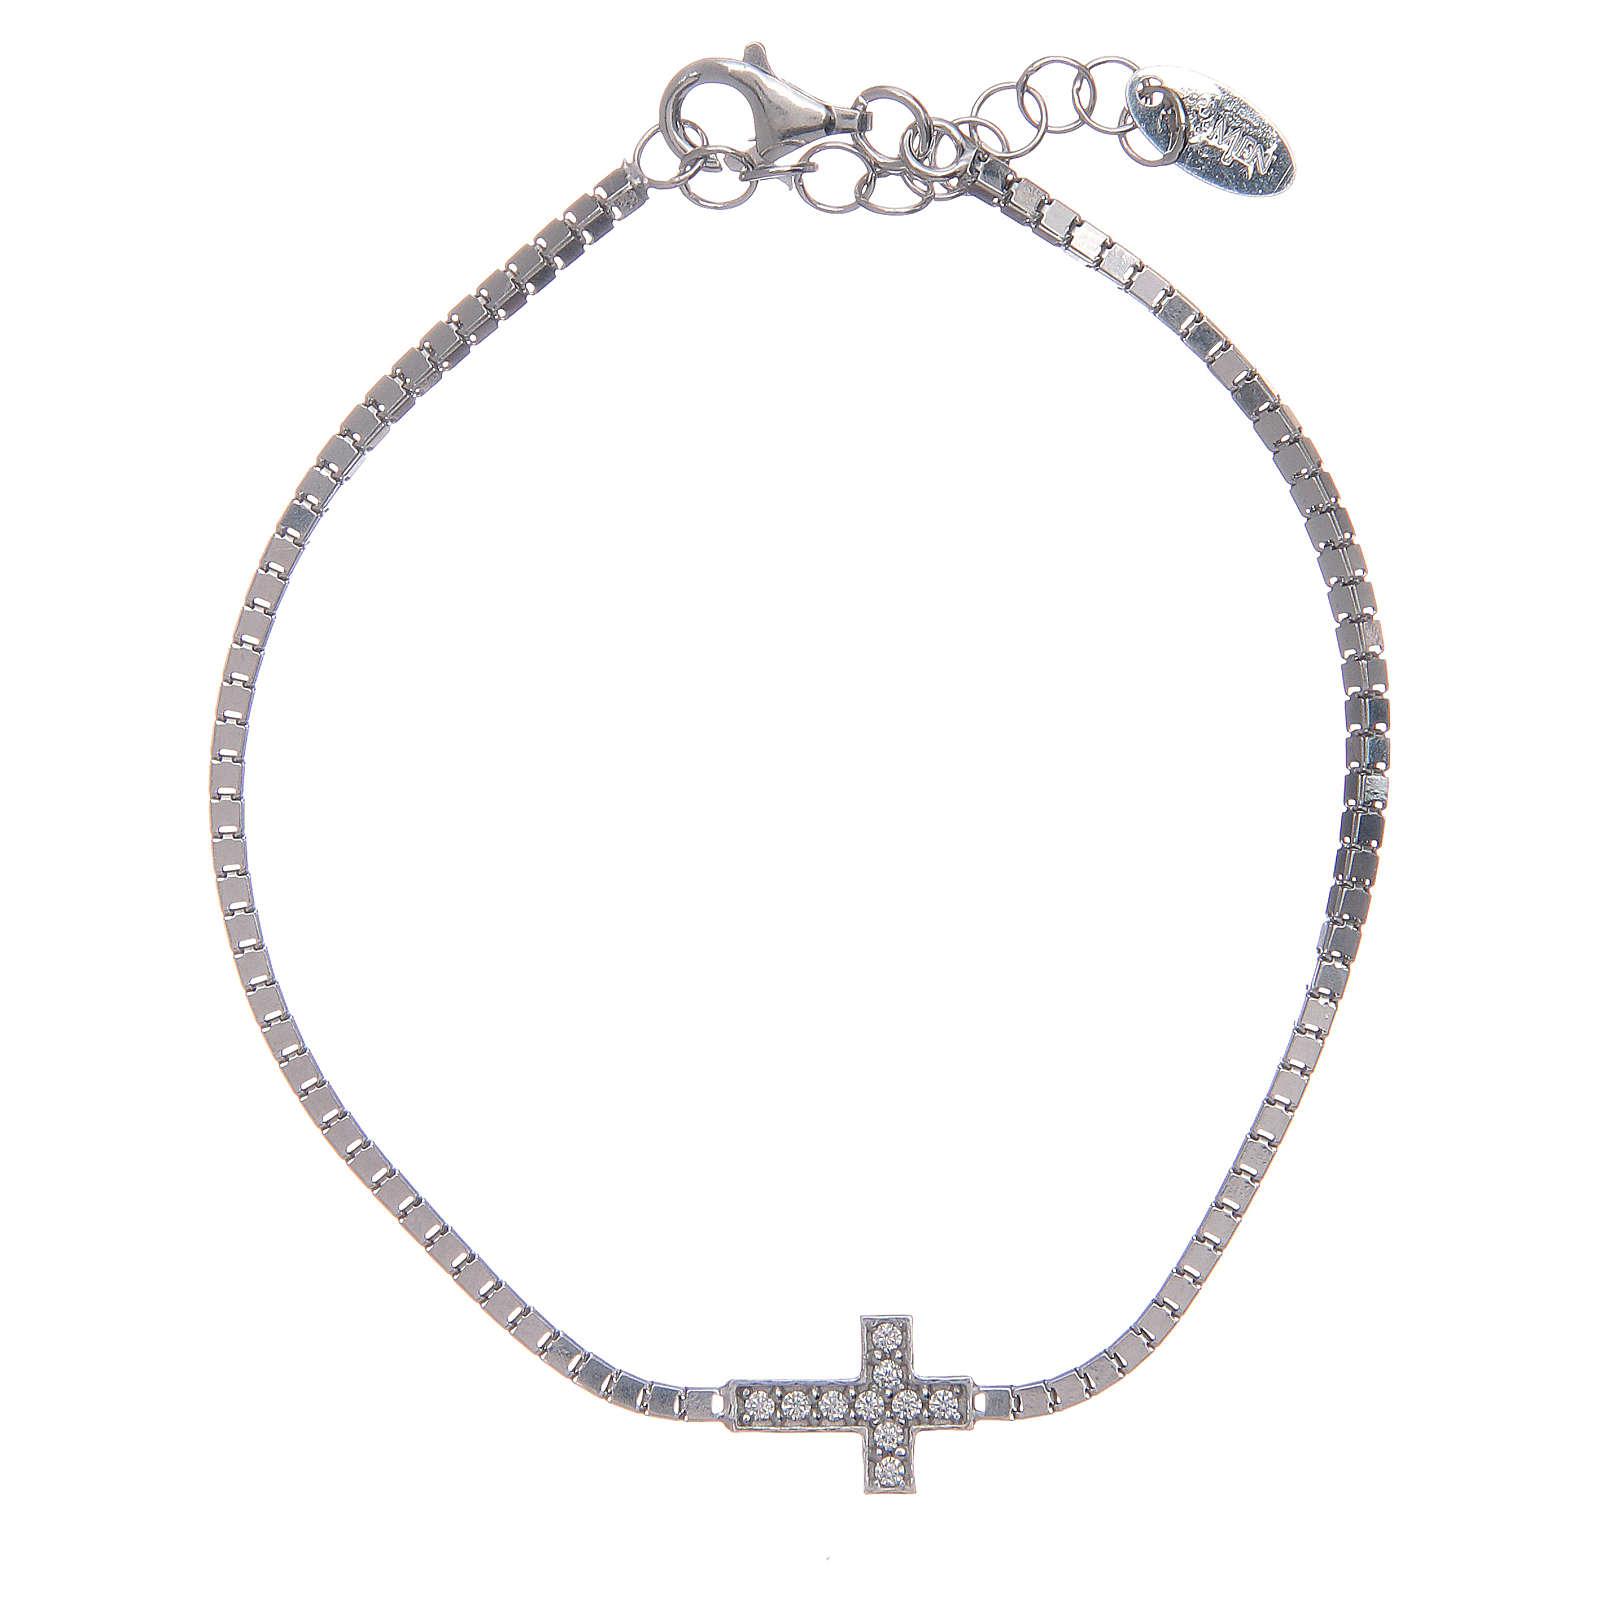 Bracciale Amen in Argento 925 croce zirconi 4